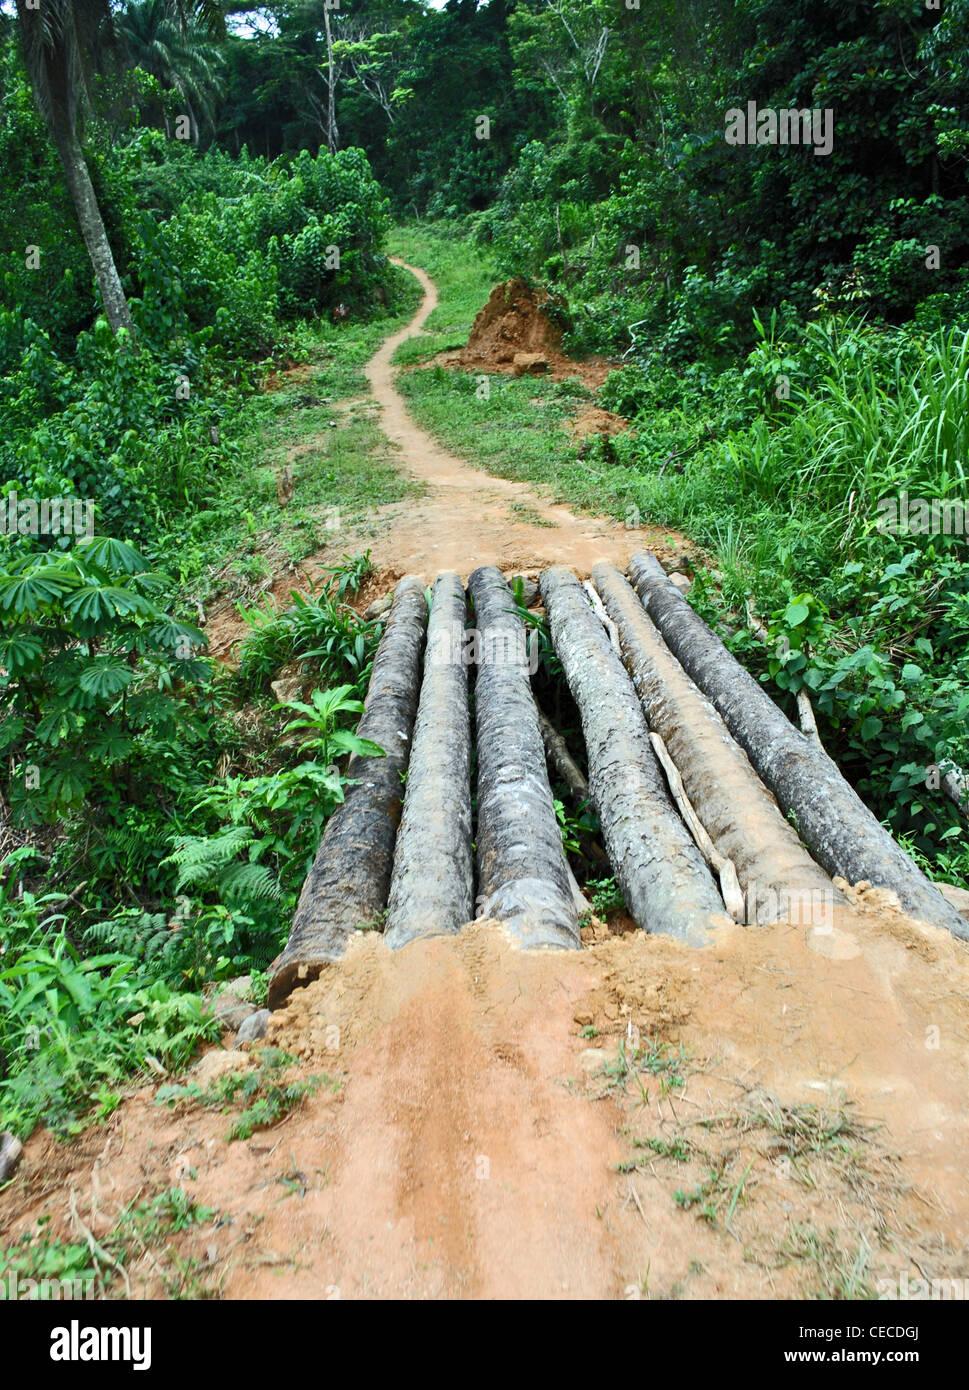 Dirt track to the Sierra Leone border, near Foya City, Liberia - Stock Image